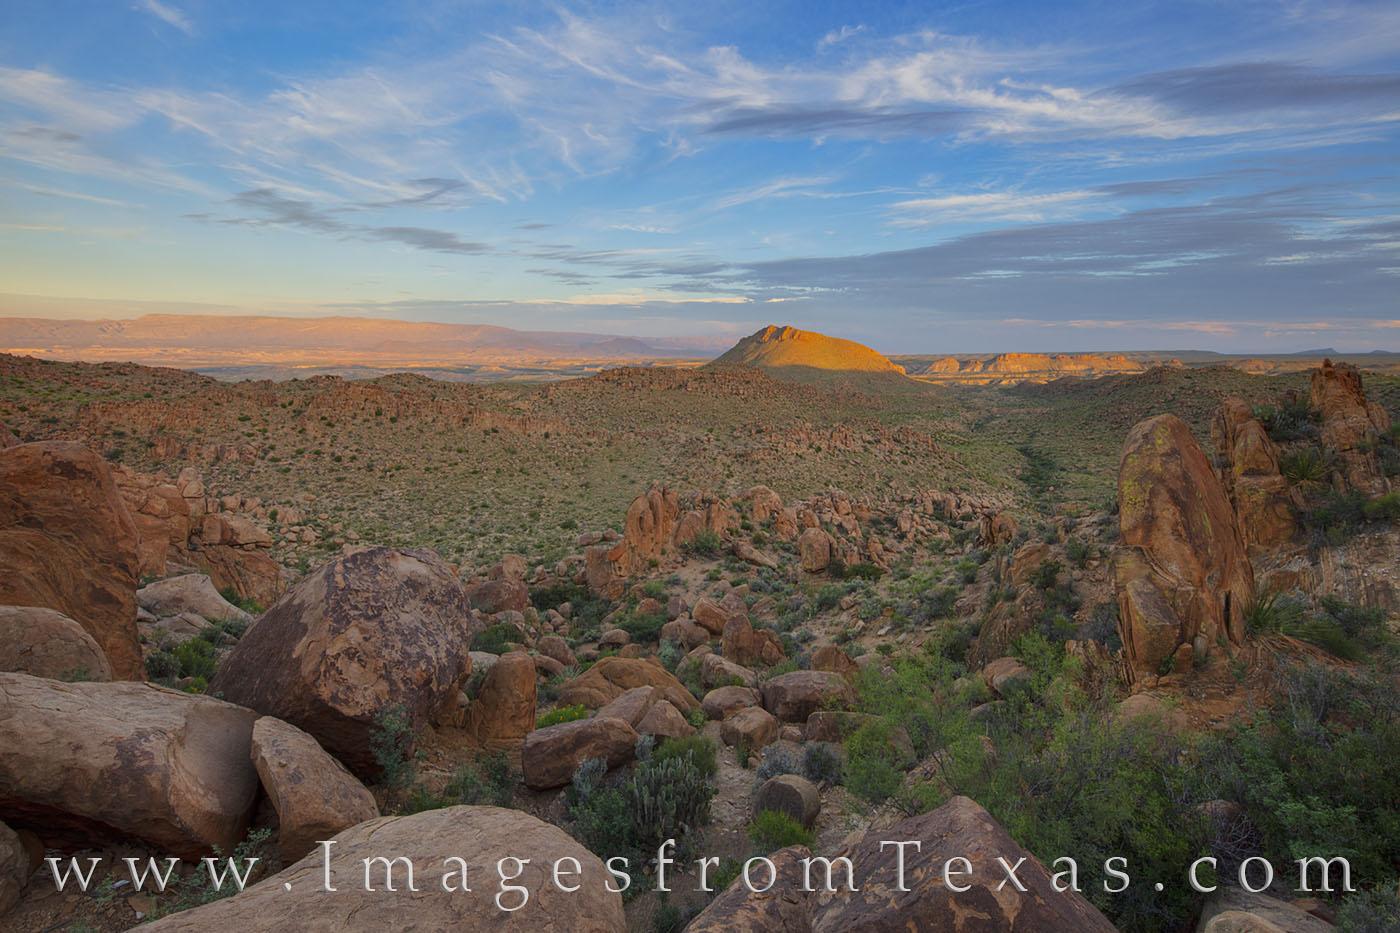 balanced rock, grapevine trail, big bend national park, big bend prints, landscape, chisos mountains, chihuahuan desert, photo